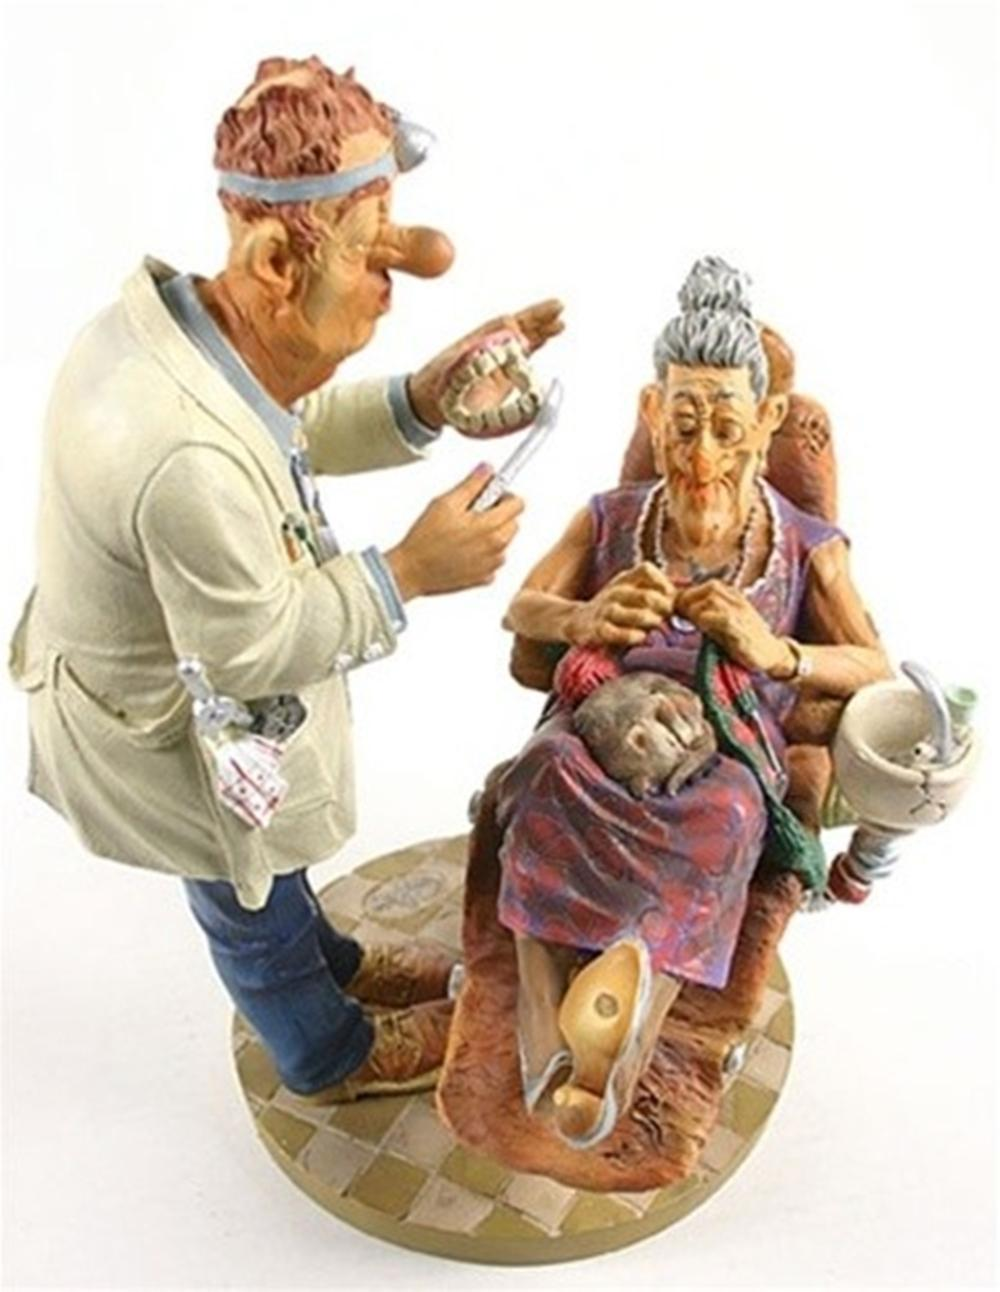 Dentist with Grandma Knitting Statue Profisti Parastone